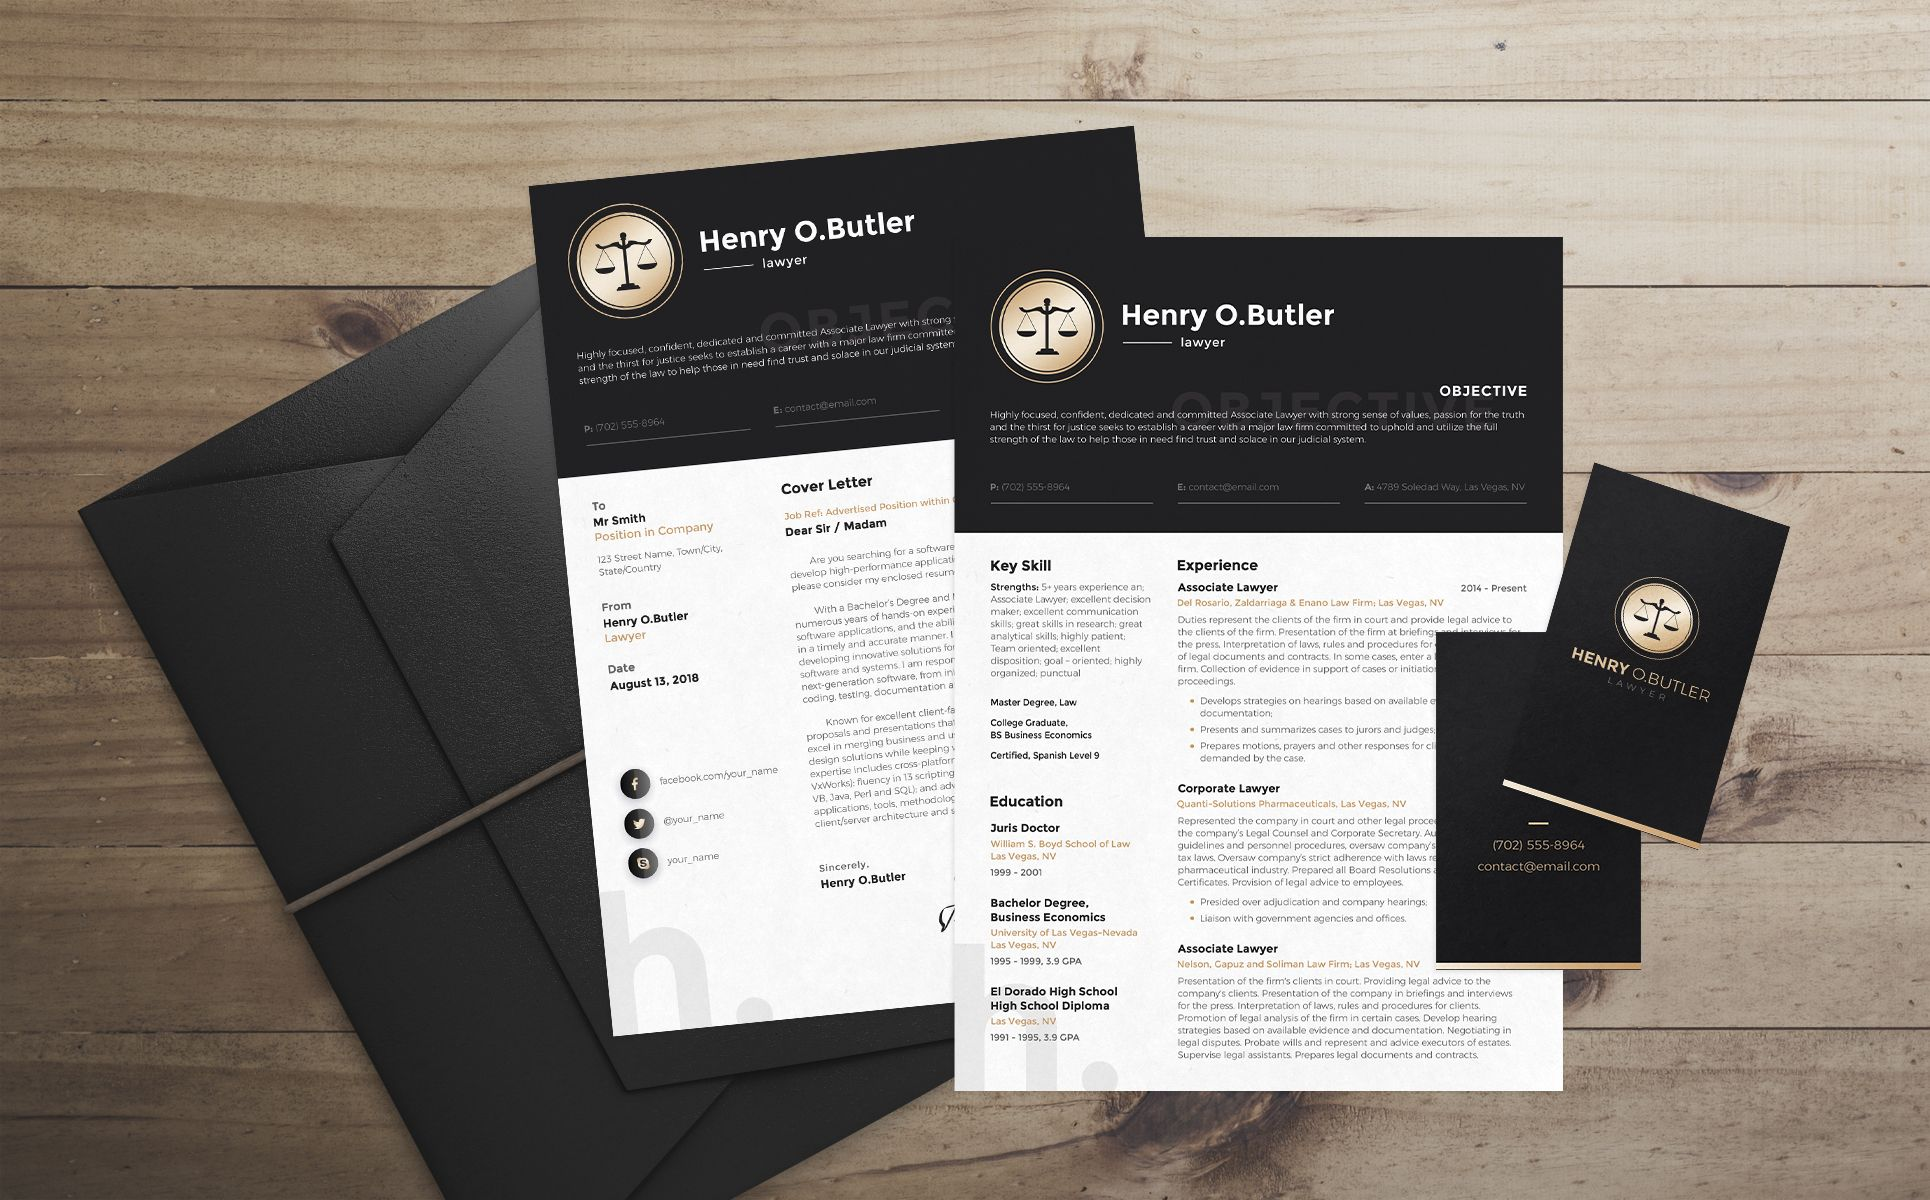 Henry O. Butler - Lawyer Resume Template | Diy | Resume ...